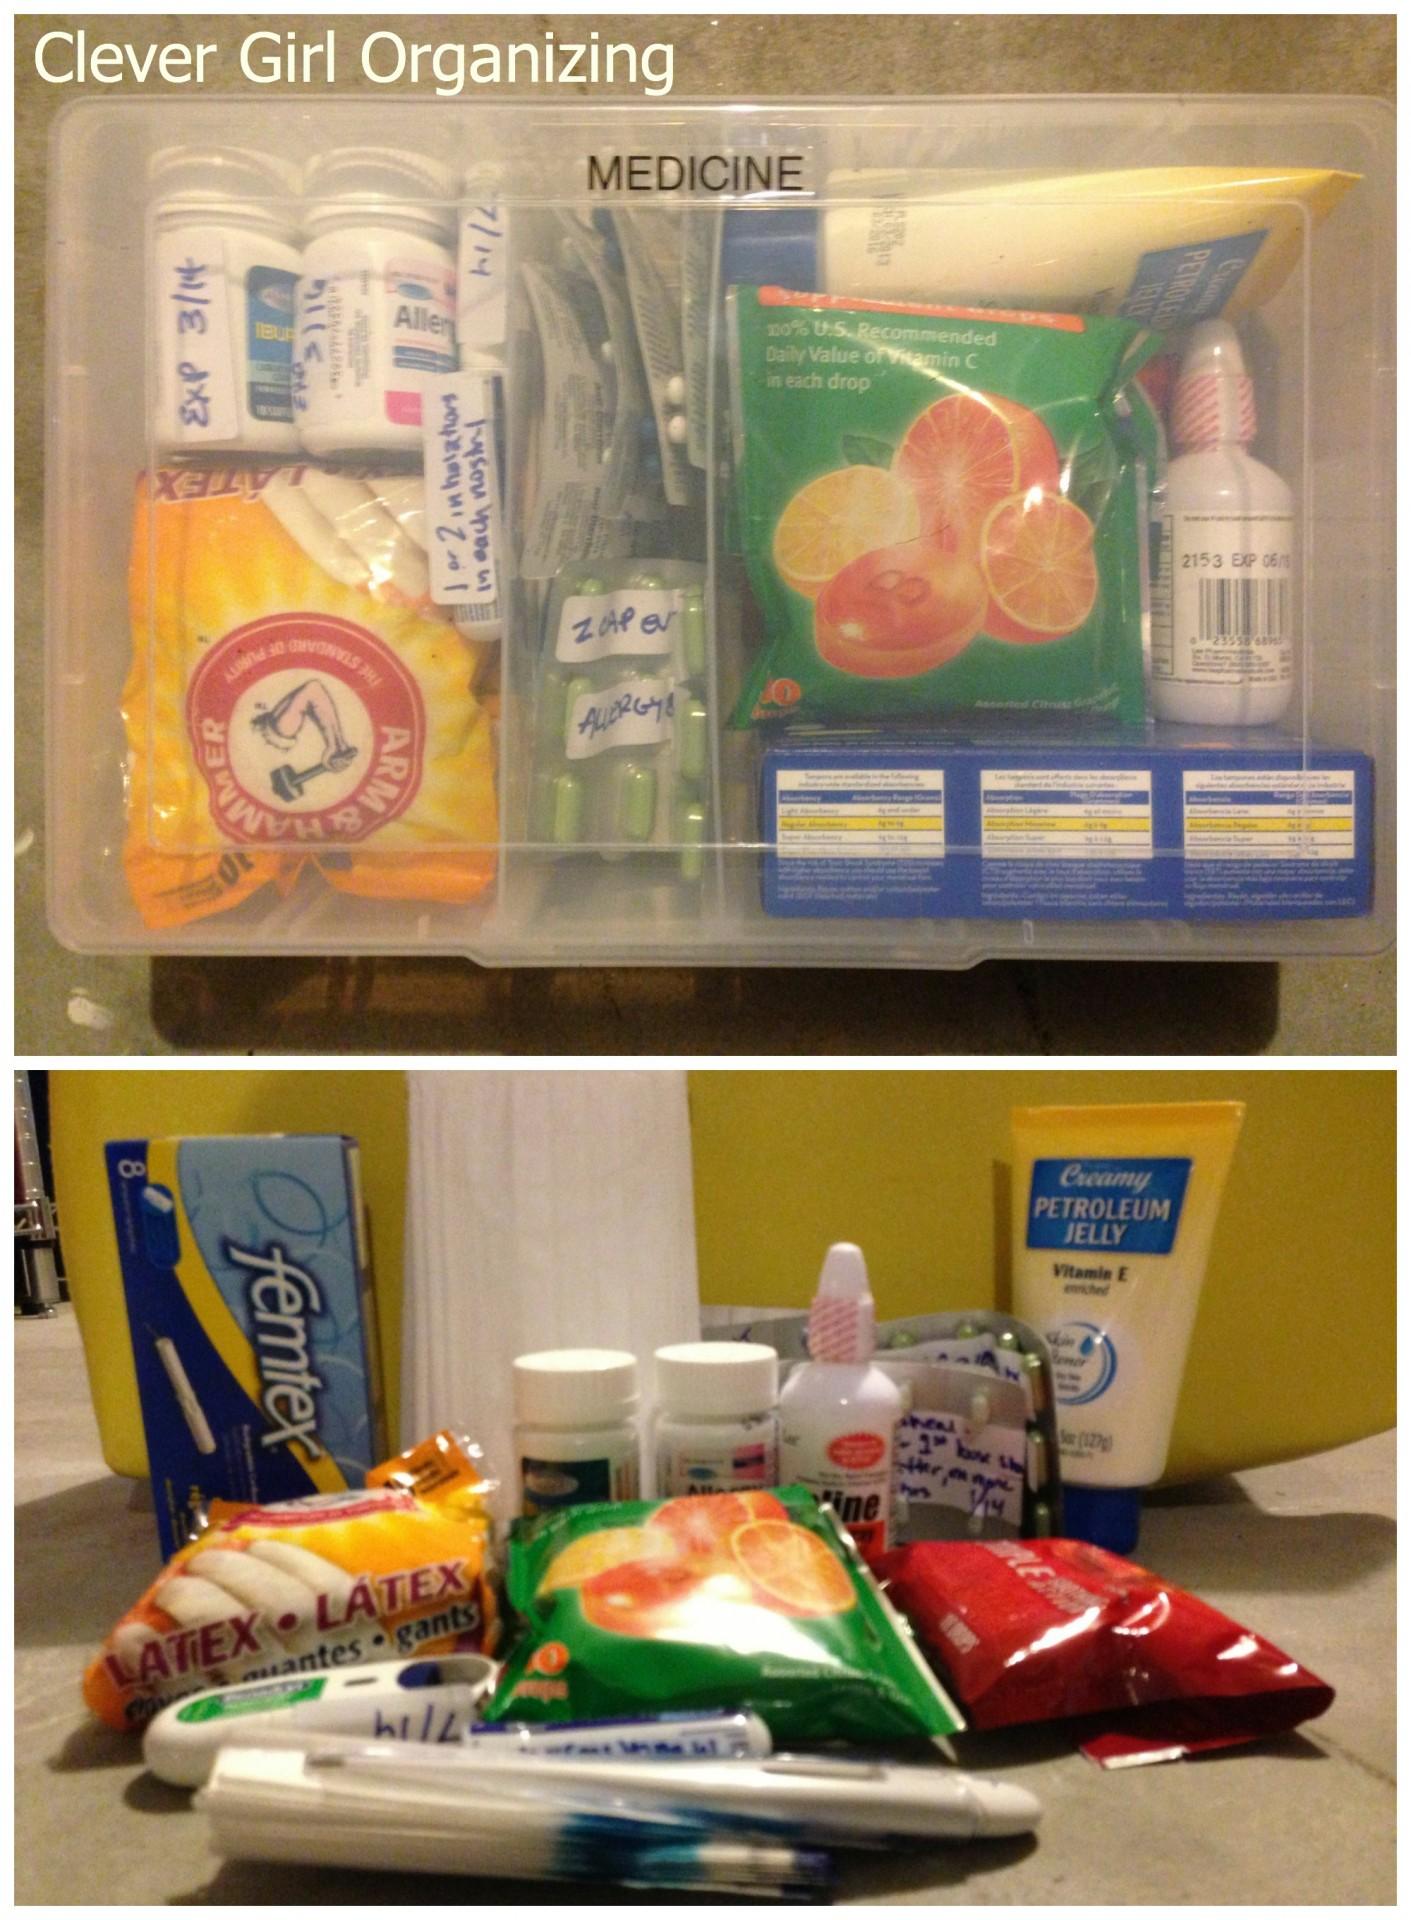 Cold/Cough, Allergy Medicine, Immodium, Petroleum Jelly, Lozenges, Saline spray, Thermometer, Latex Gloves, Dust Masks, Inhaler, etc.